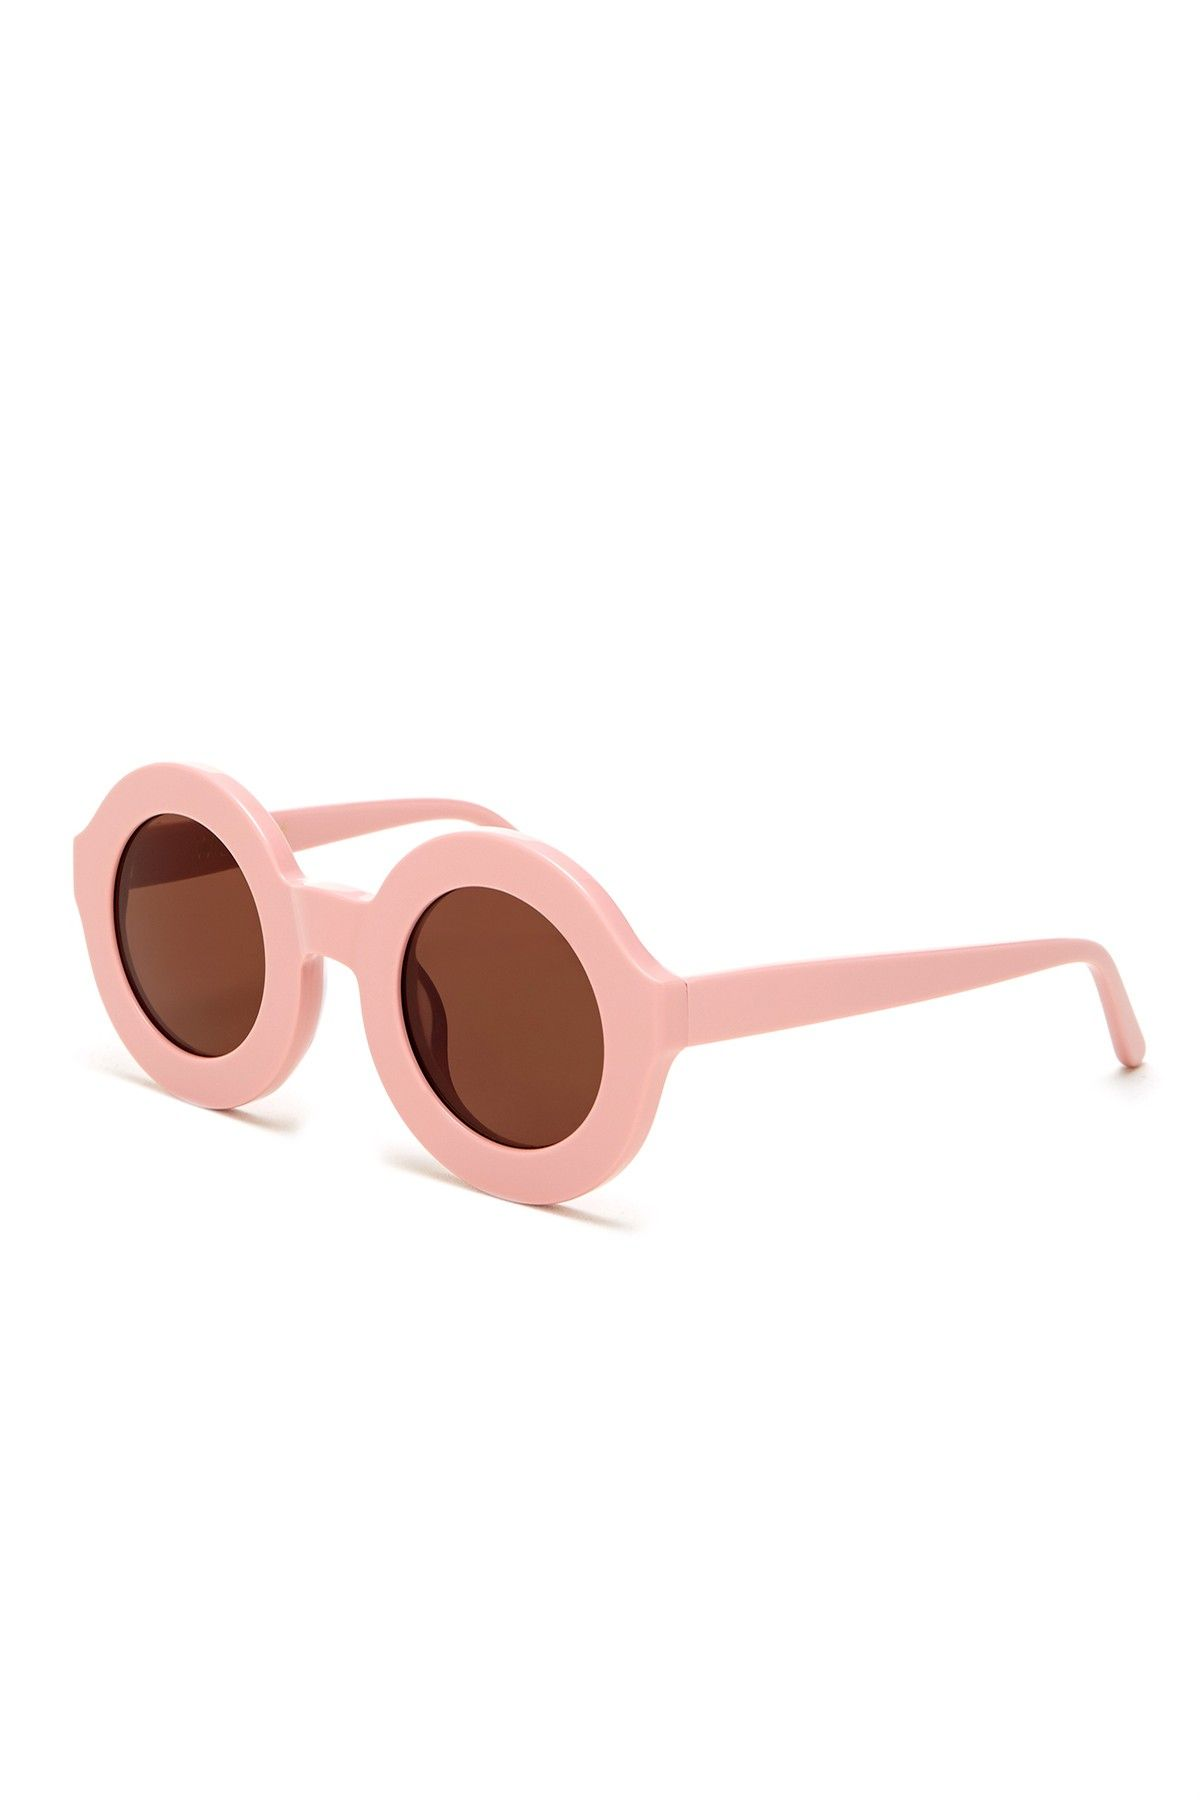 WILDFOX | Women's Twiggy Round Plastic Sunglasses | Nordstrom Rack